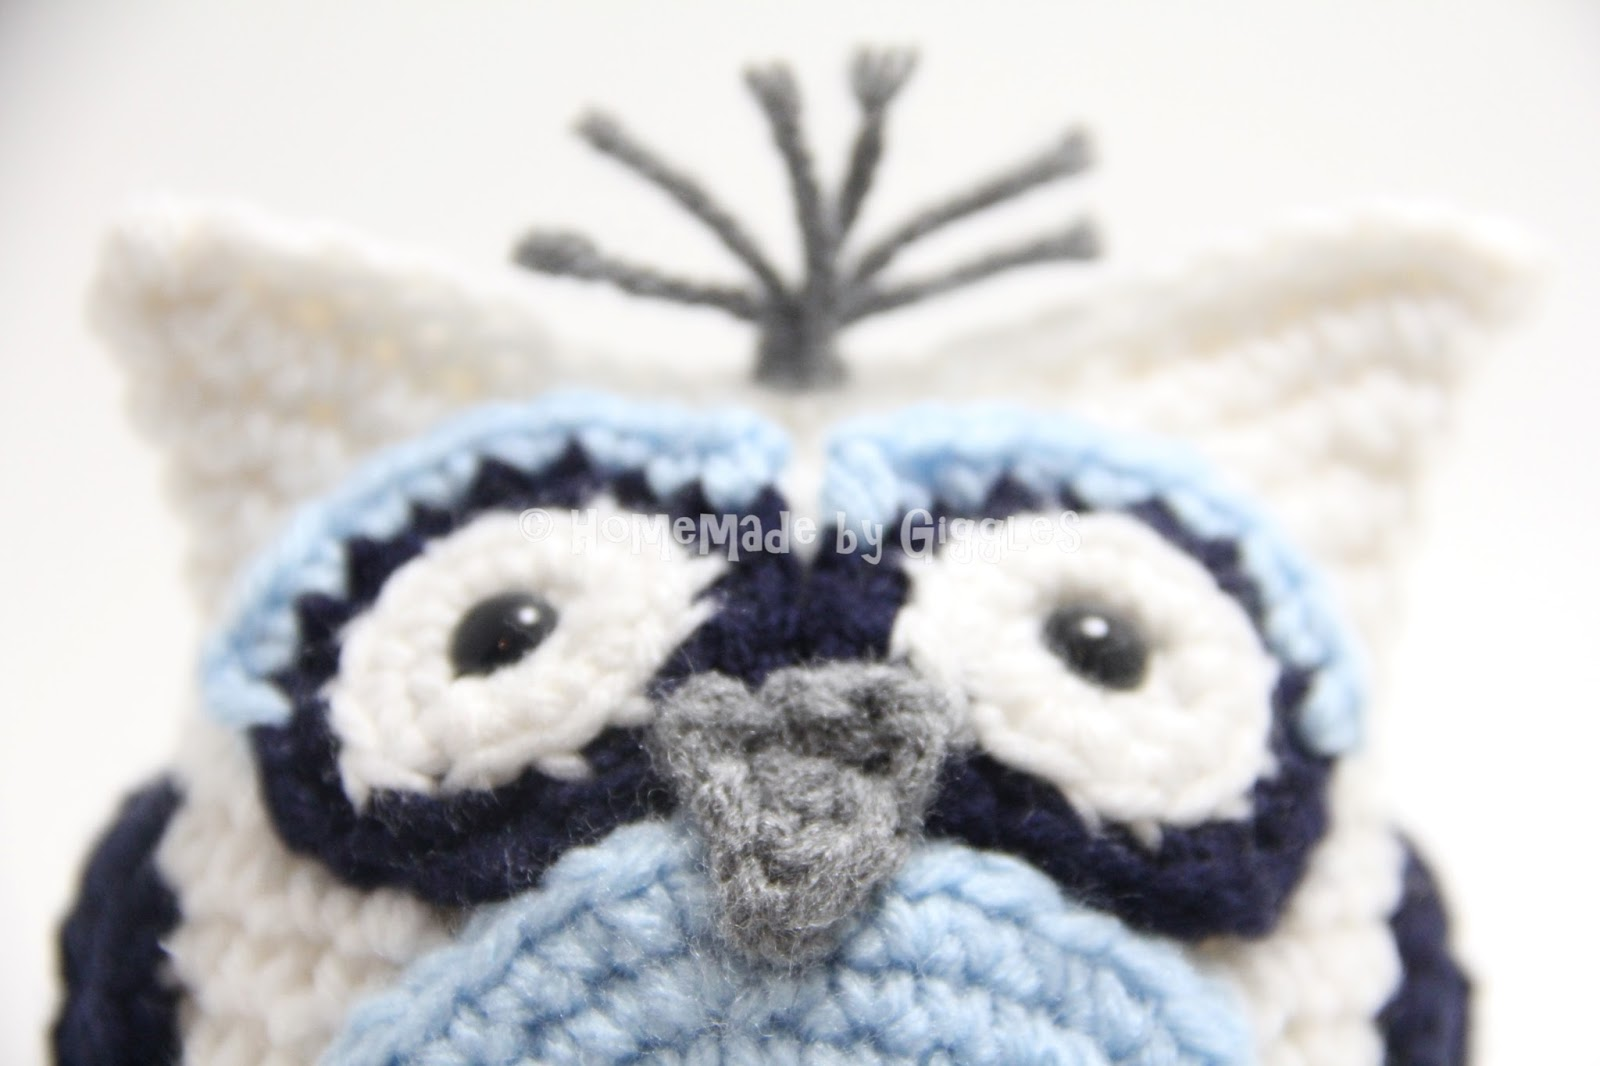 Amigurumi Owl Free Pattern : Homemade by giggles: bean bag owl free crochet pattern!